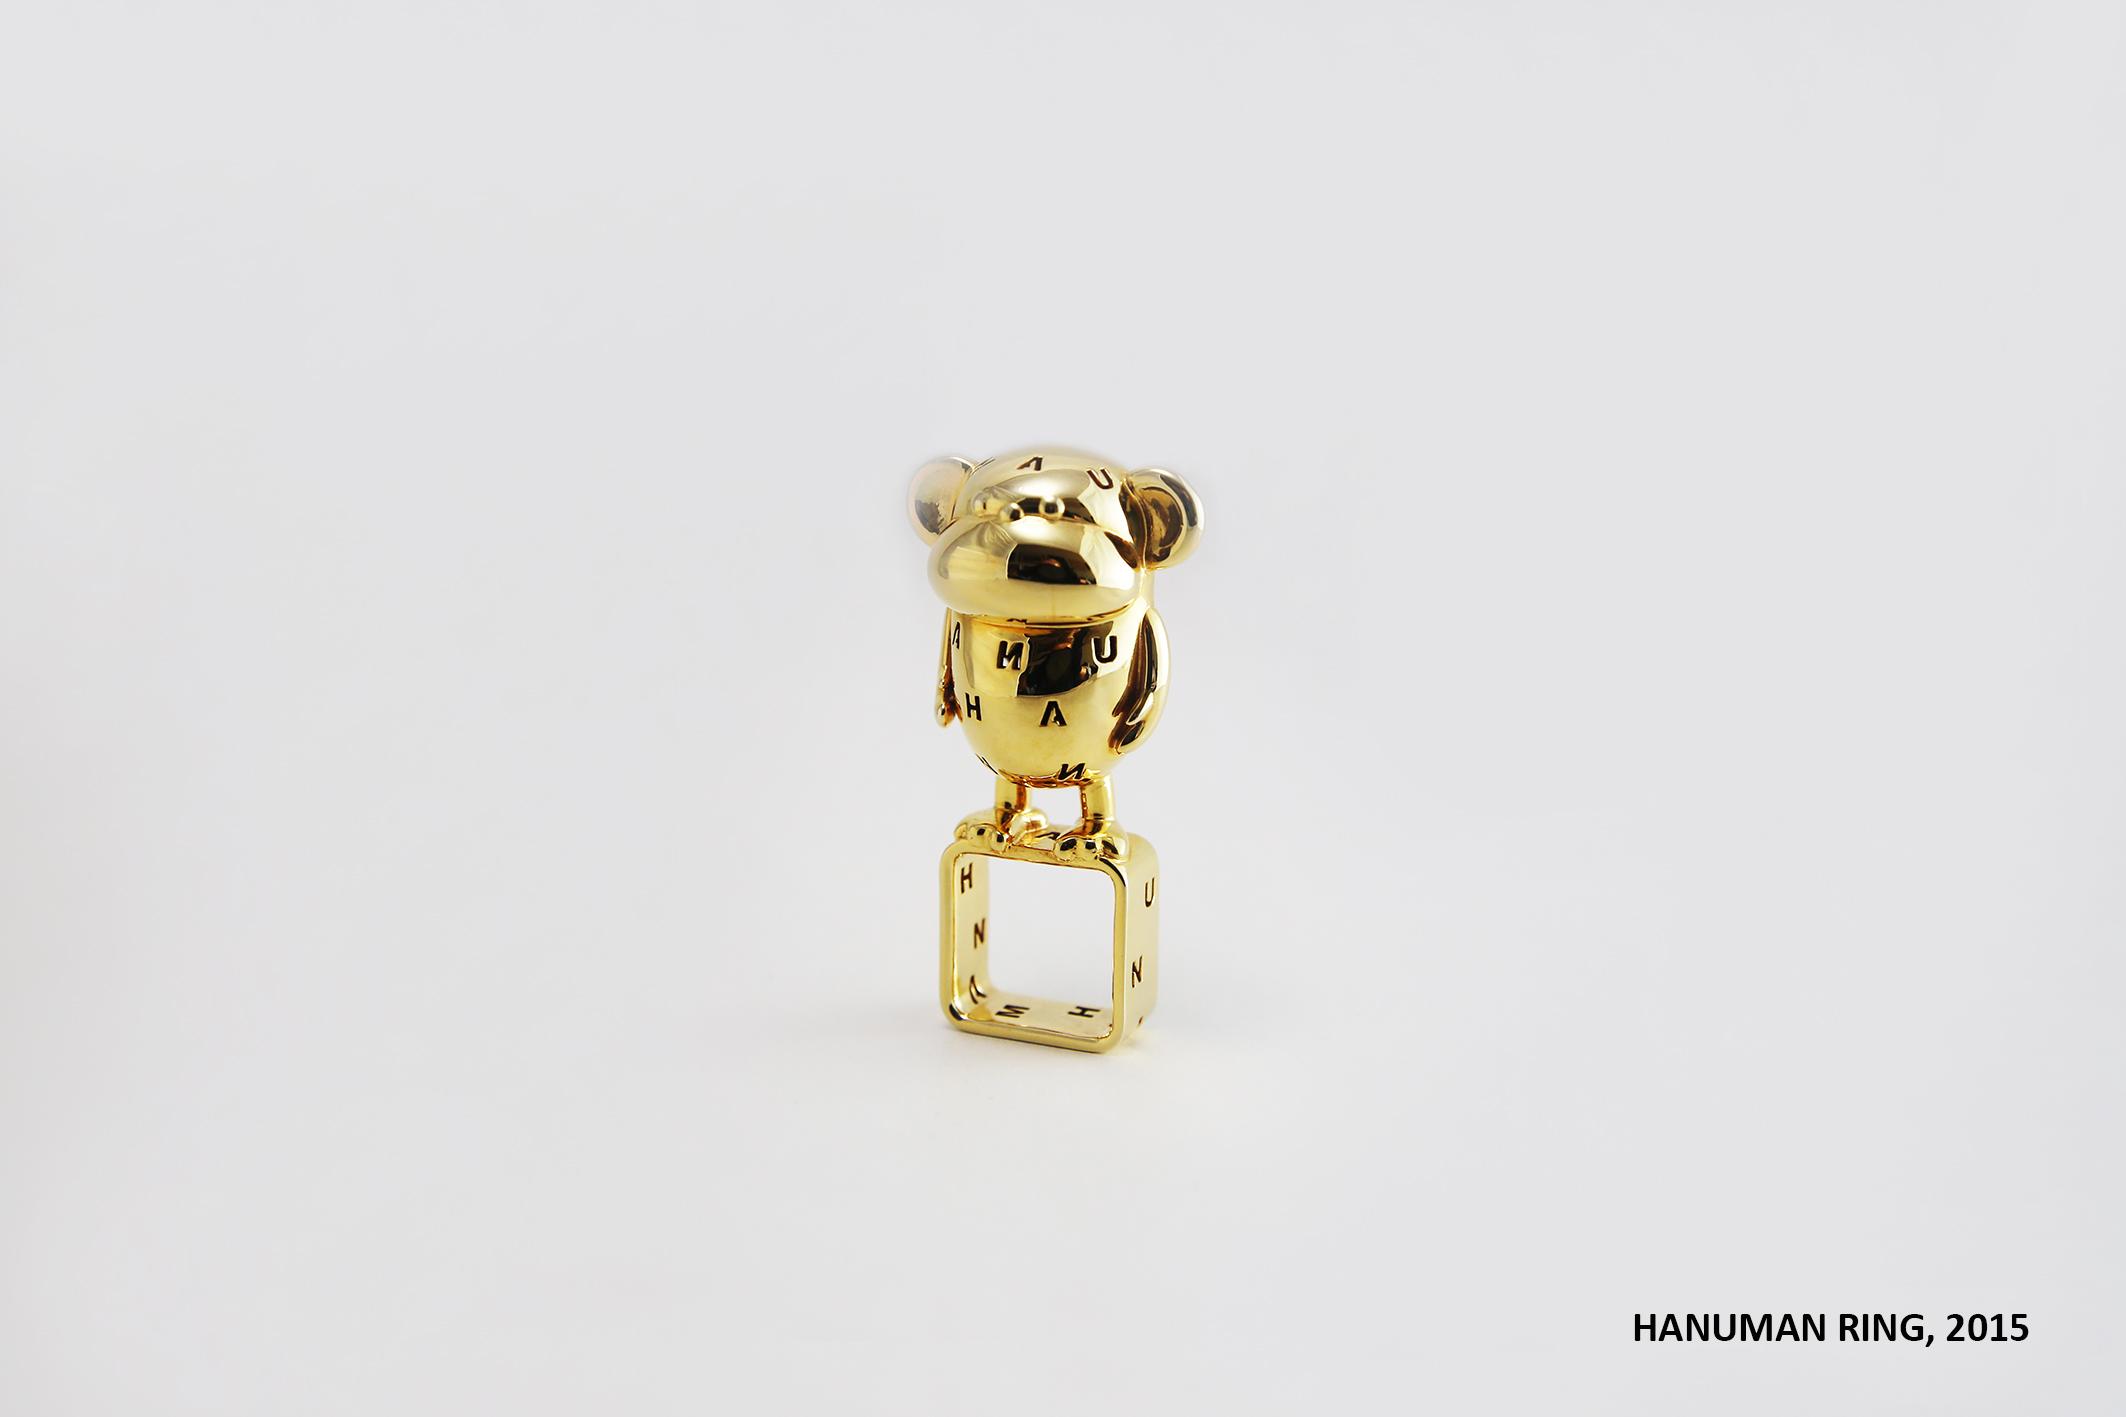 Hanuman ring 1